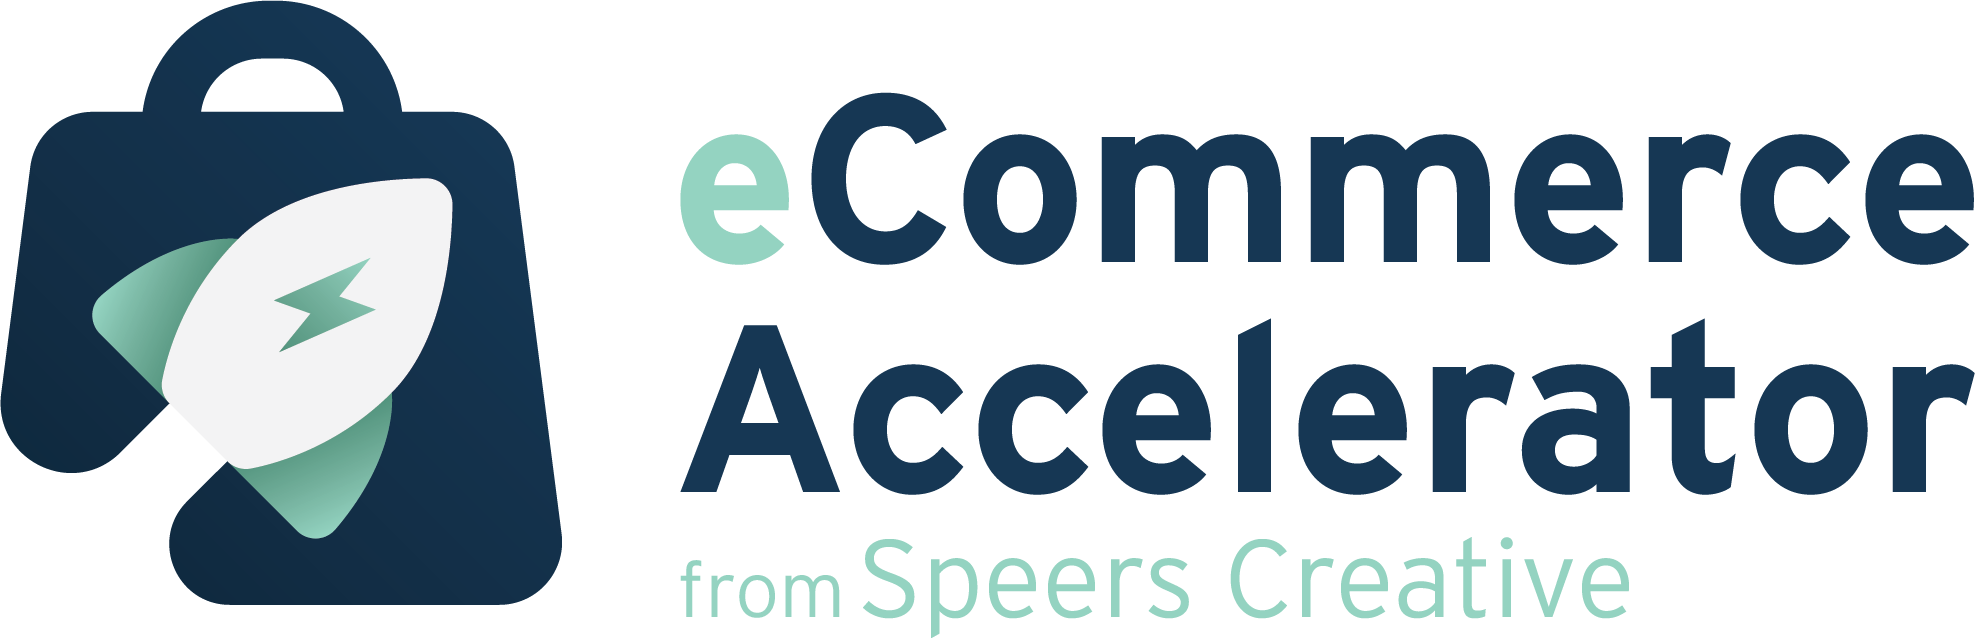 eCommerce Accelerator Logo - Speers Creative